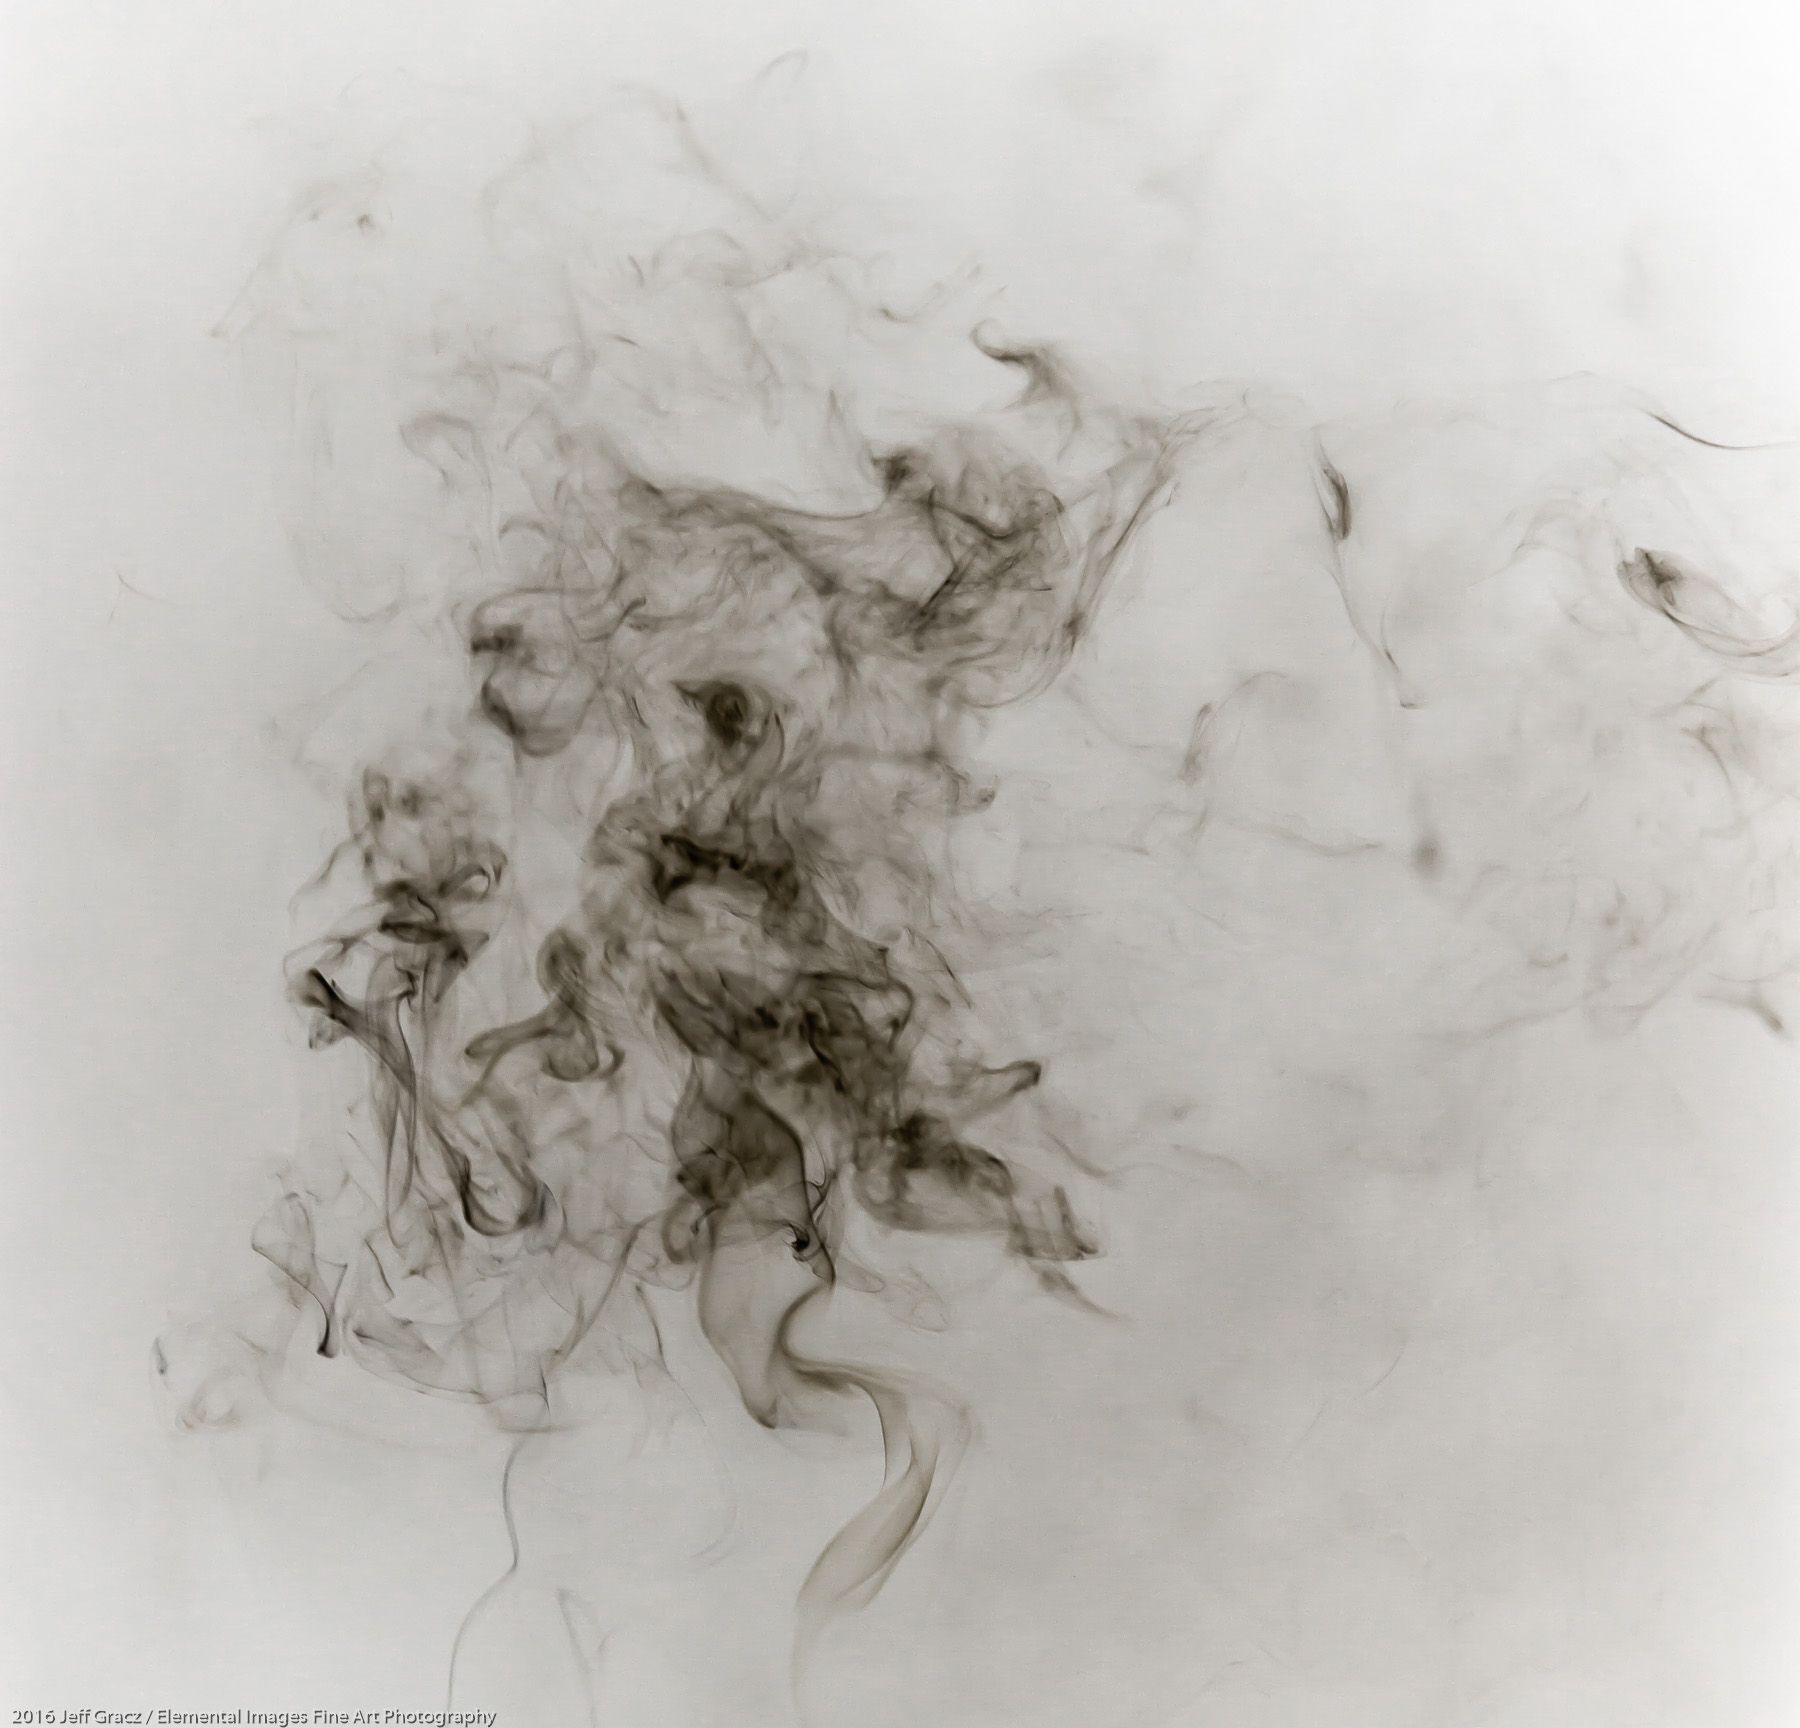 Smoke 9 | Vancouver | WA | USA - © 2016 Jeff Gracz / Elemental Images Fine Art Photography - All Rights Reserved Worldwide